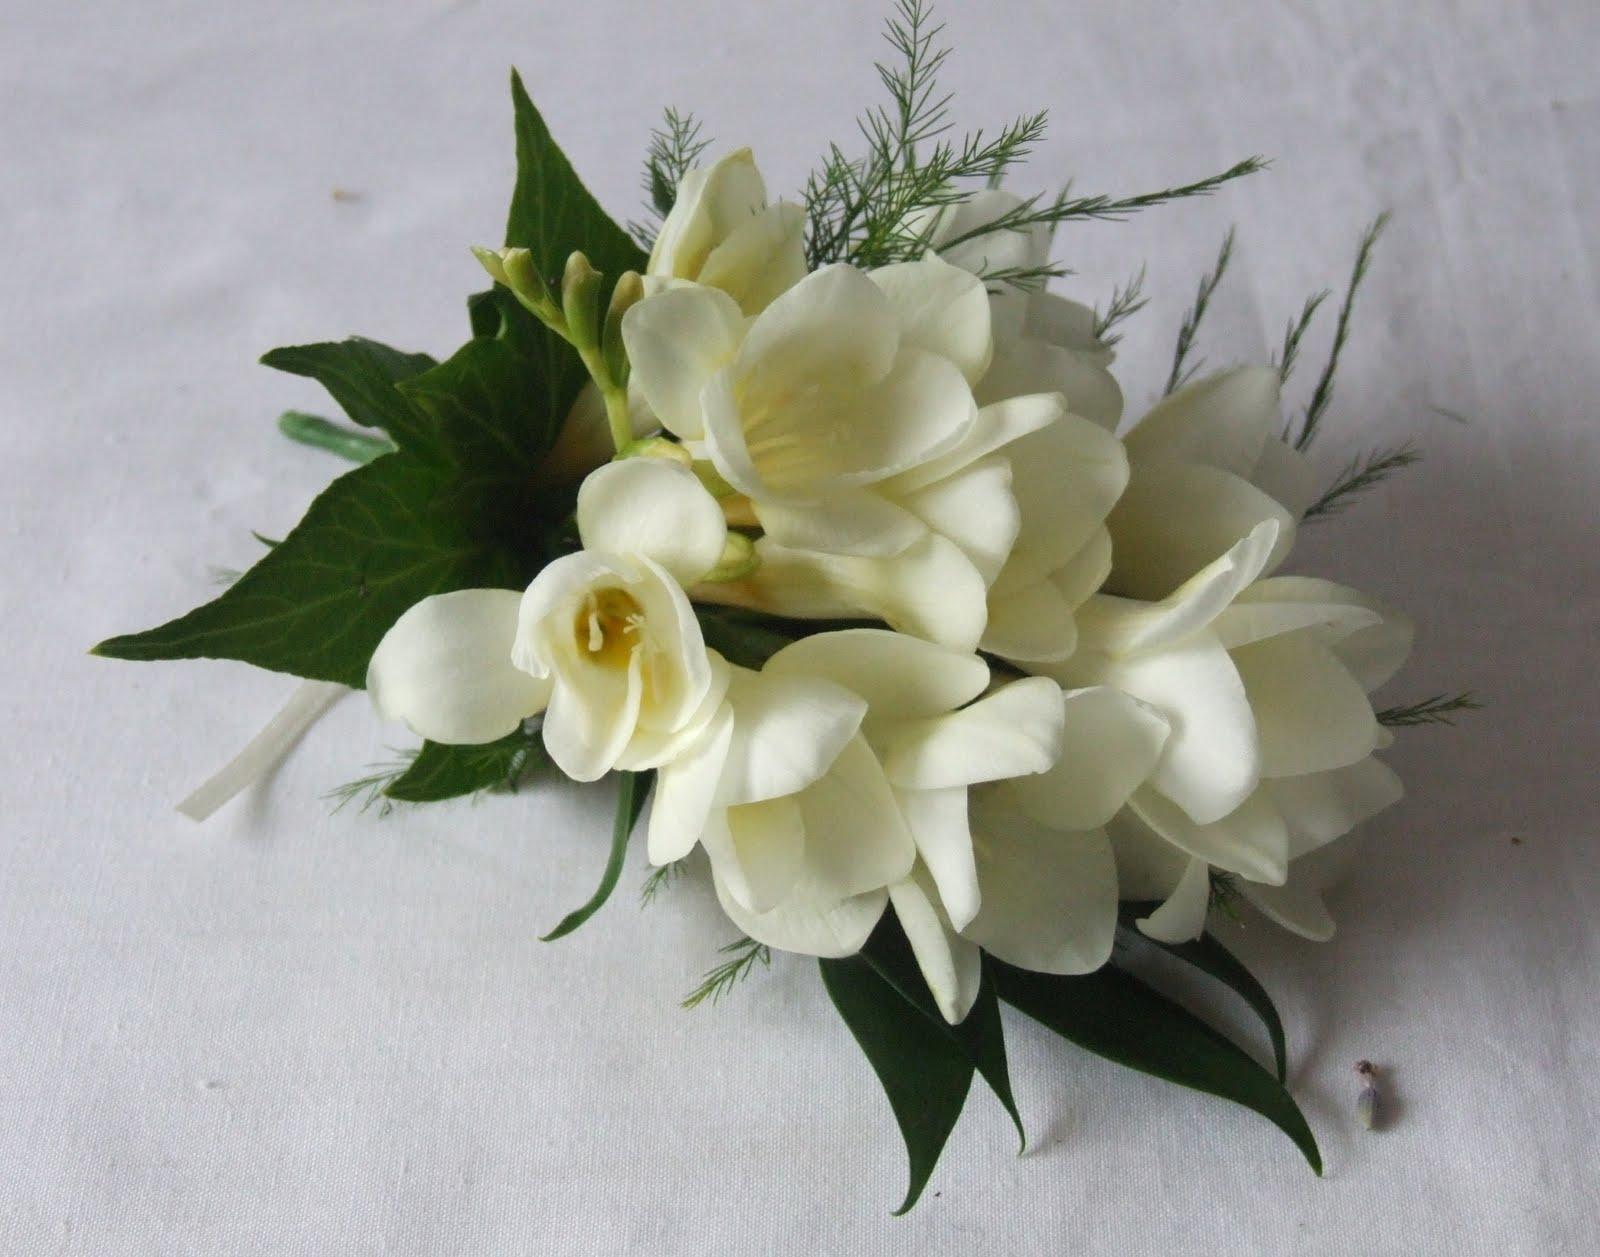 Rj S Florist Yellow Roses White Freesia And Blue Agapanthus